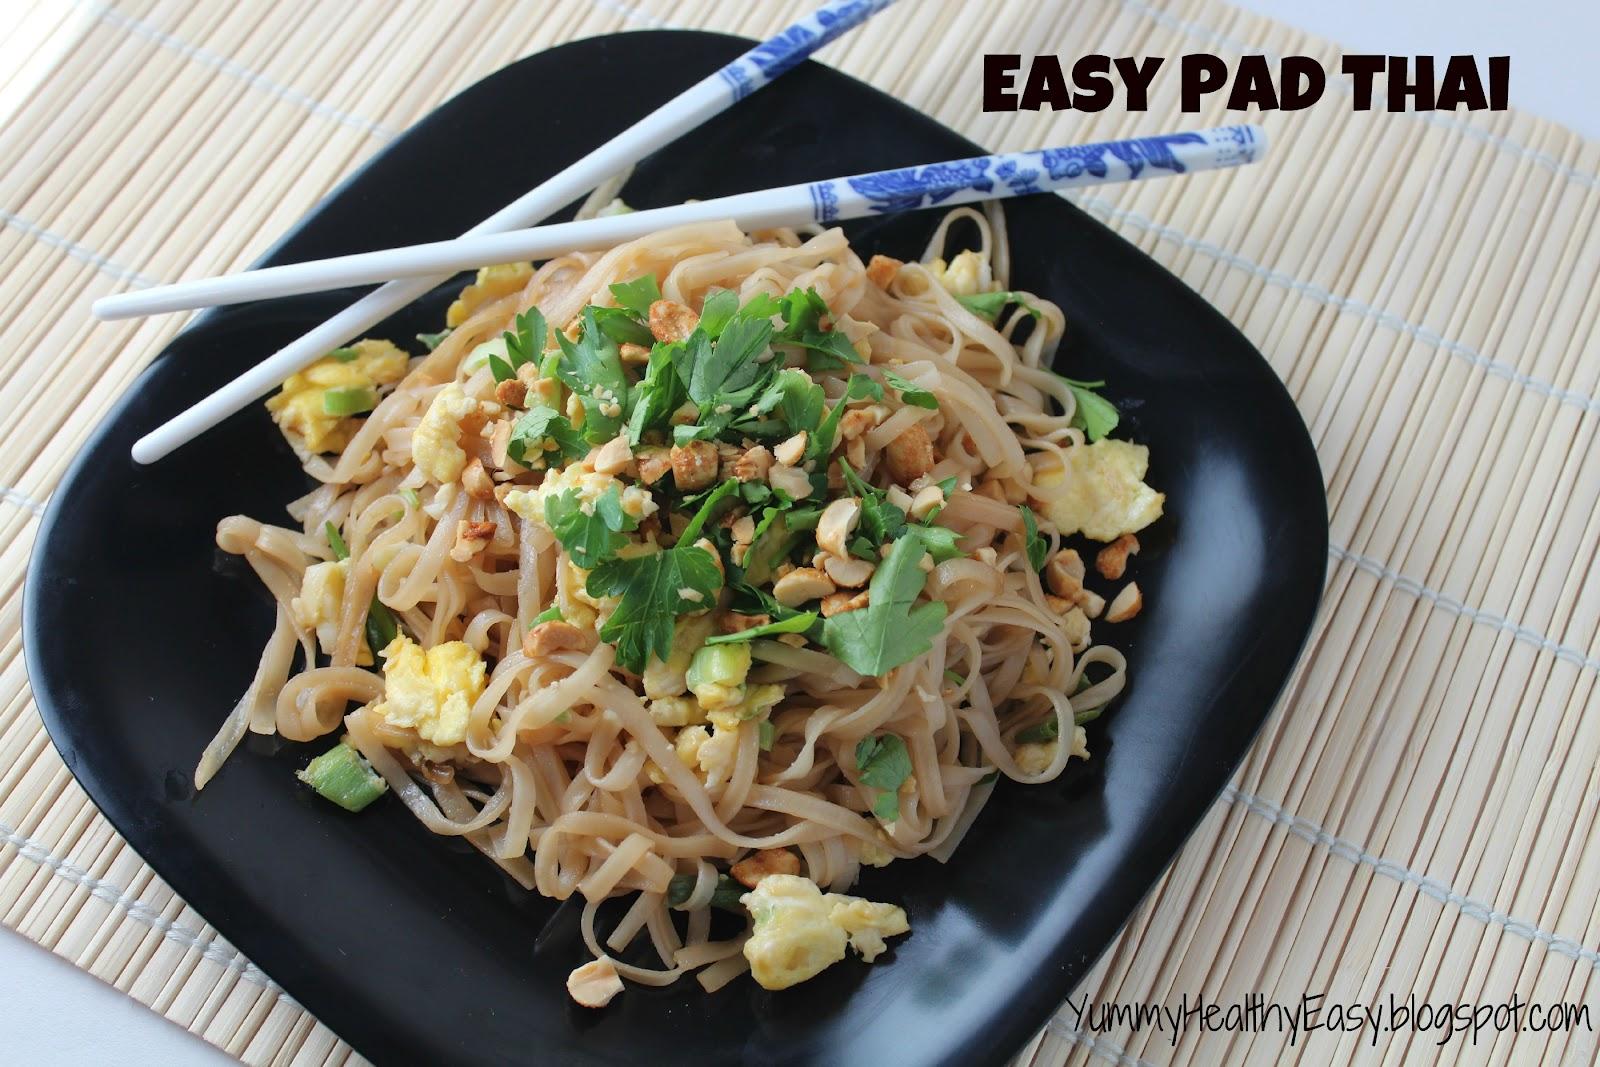 ... veggie sandwich vegetable pad thai vegetarian pad thai recipe